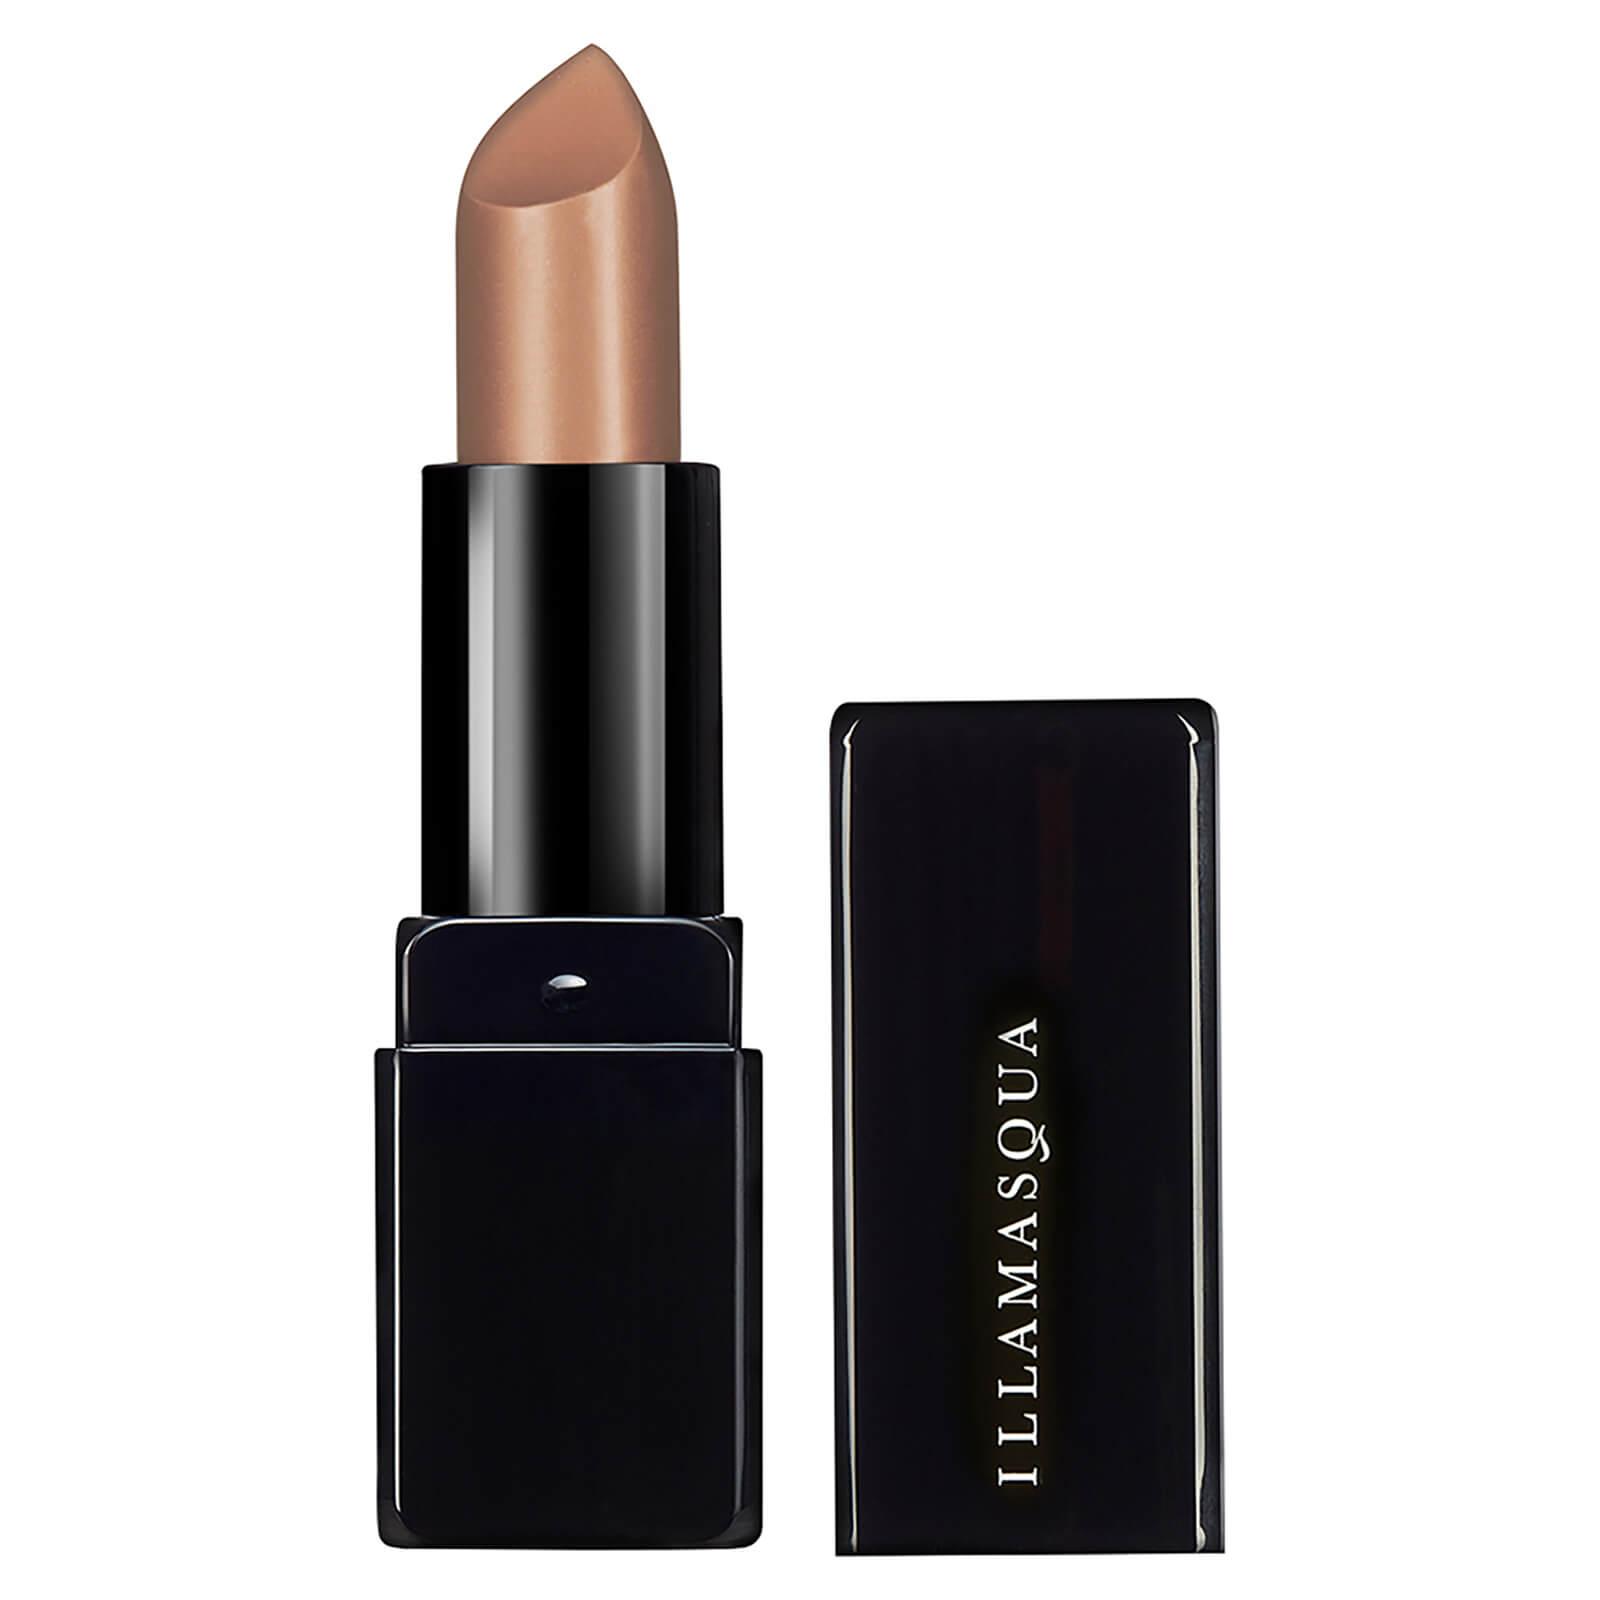 Illamasqua Sheer Veil Lipstick 4g (Various Shades) - Souffle